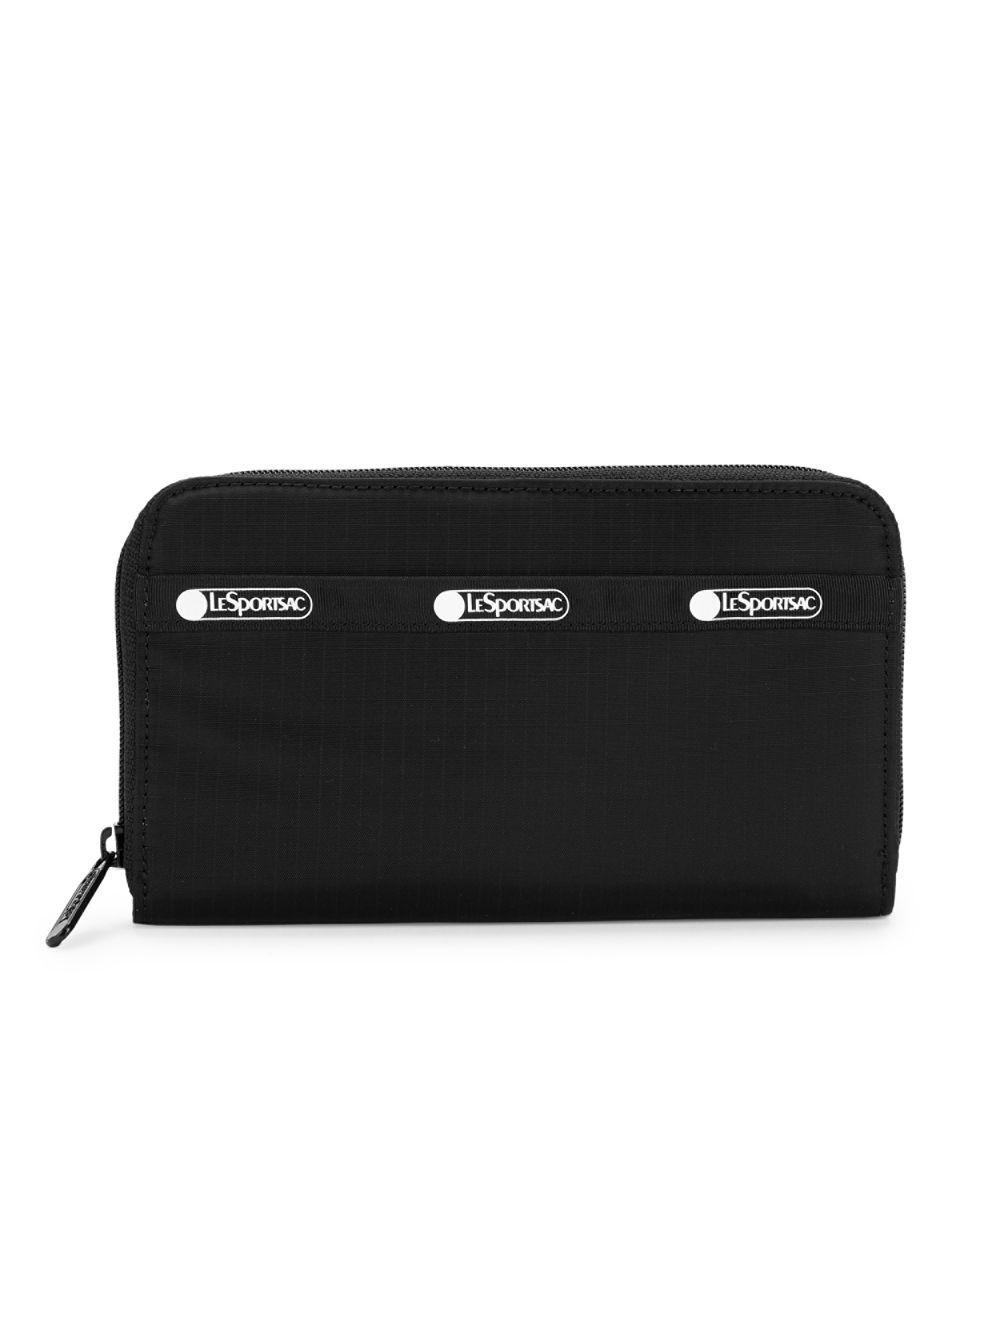 0b717412a1a8 Lyst - LeSportsac Logo Zip-around Nylon Pouch in Black